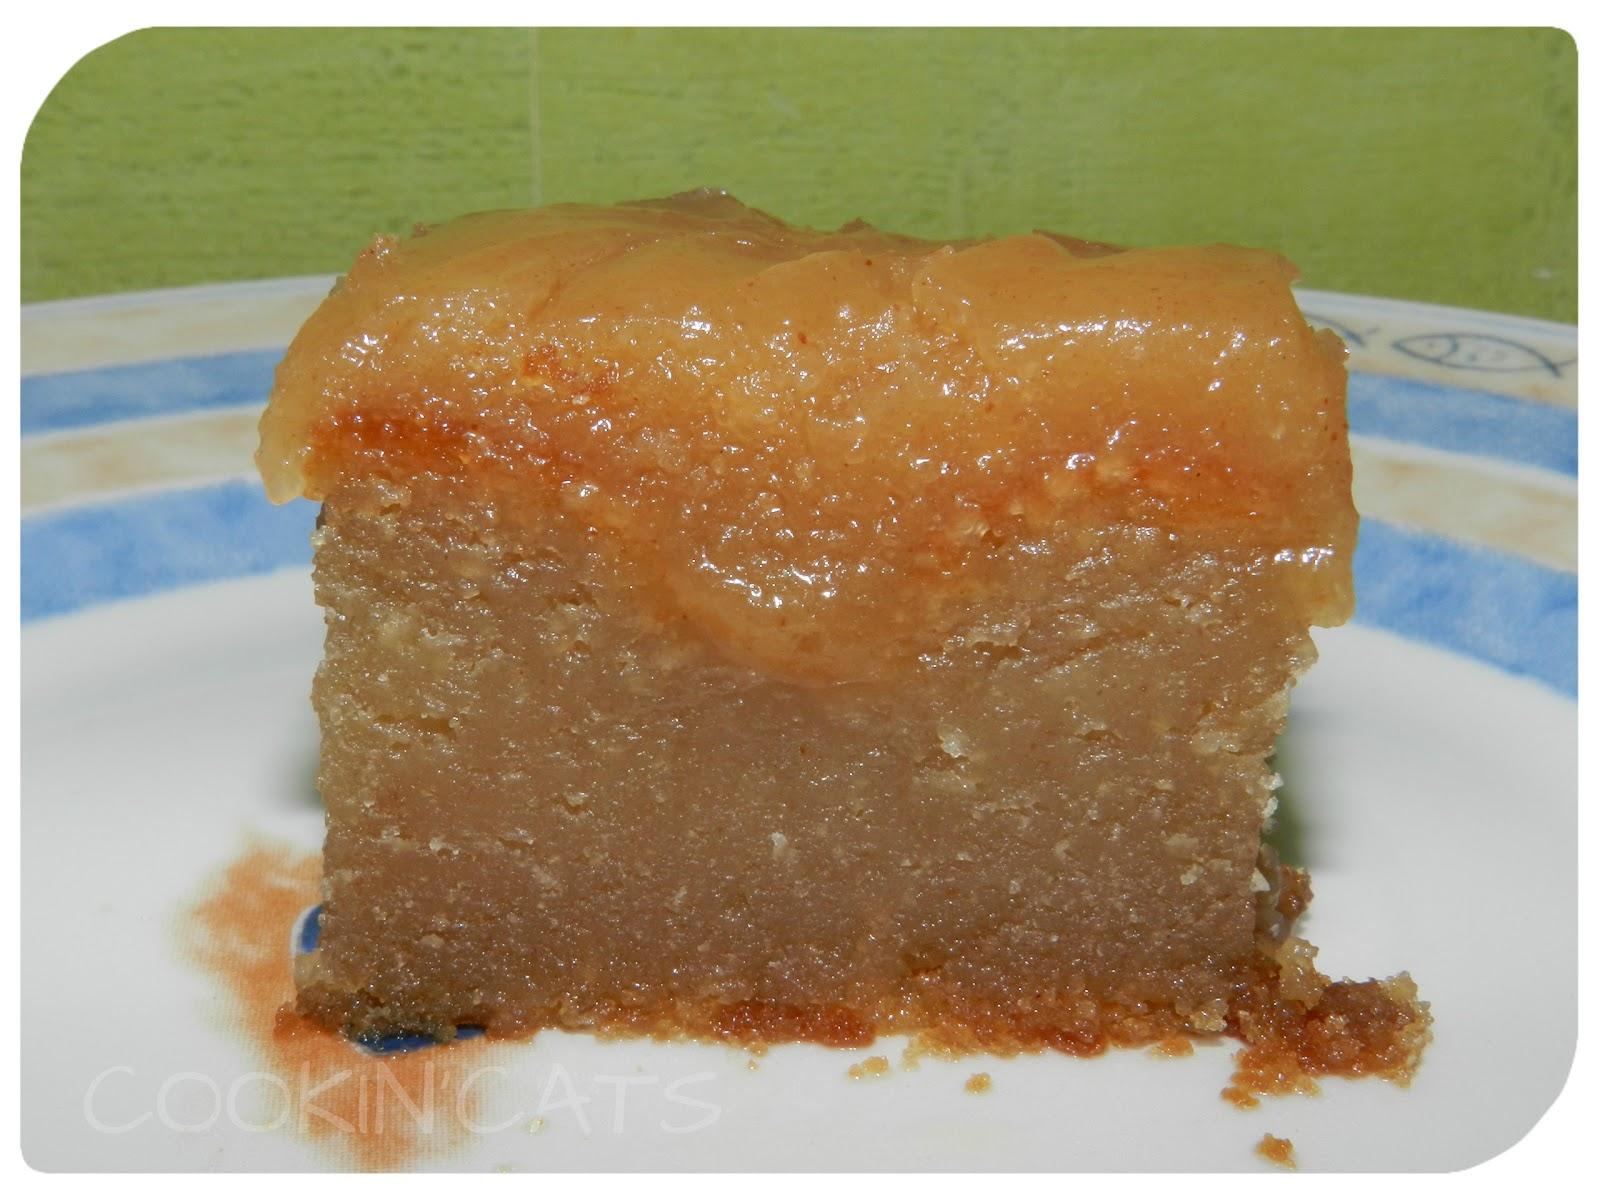 Sheet cake texan au beurre de cacahuete - Gateau beurre de cacahuete ...